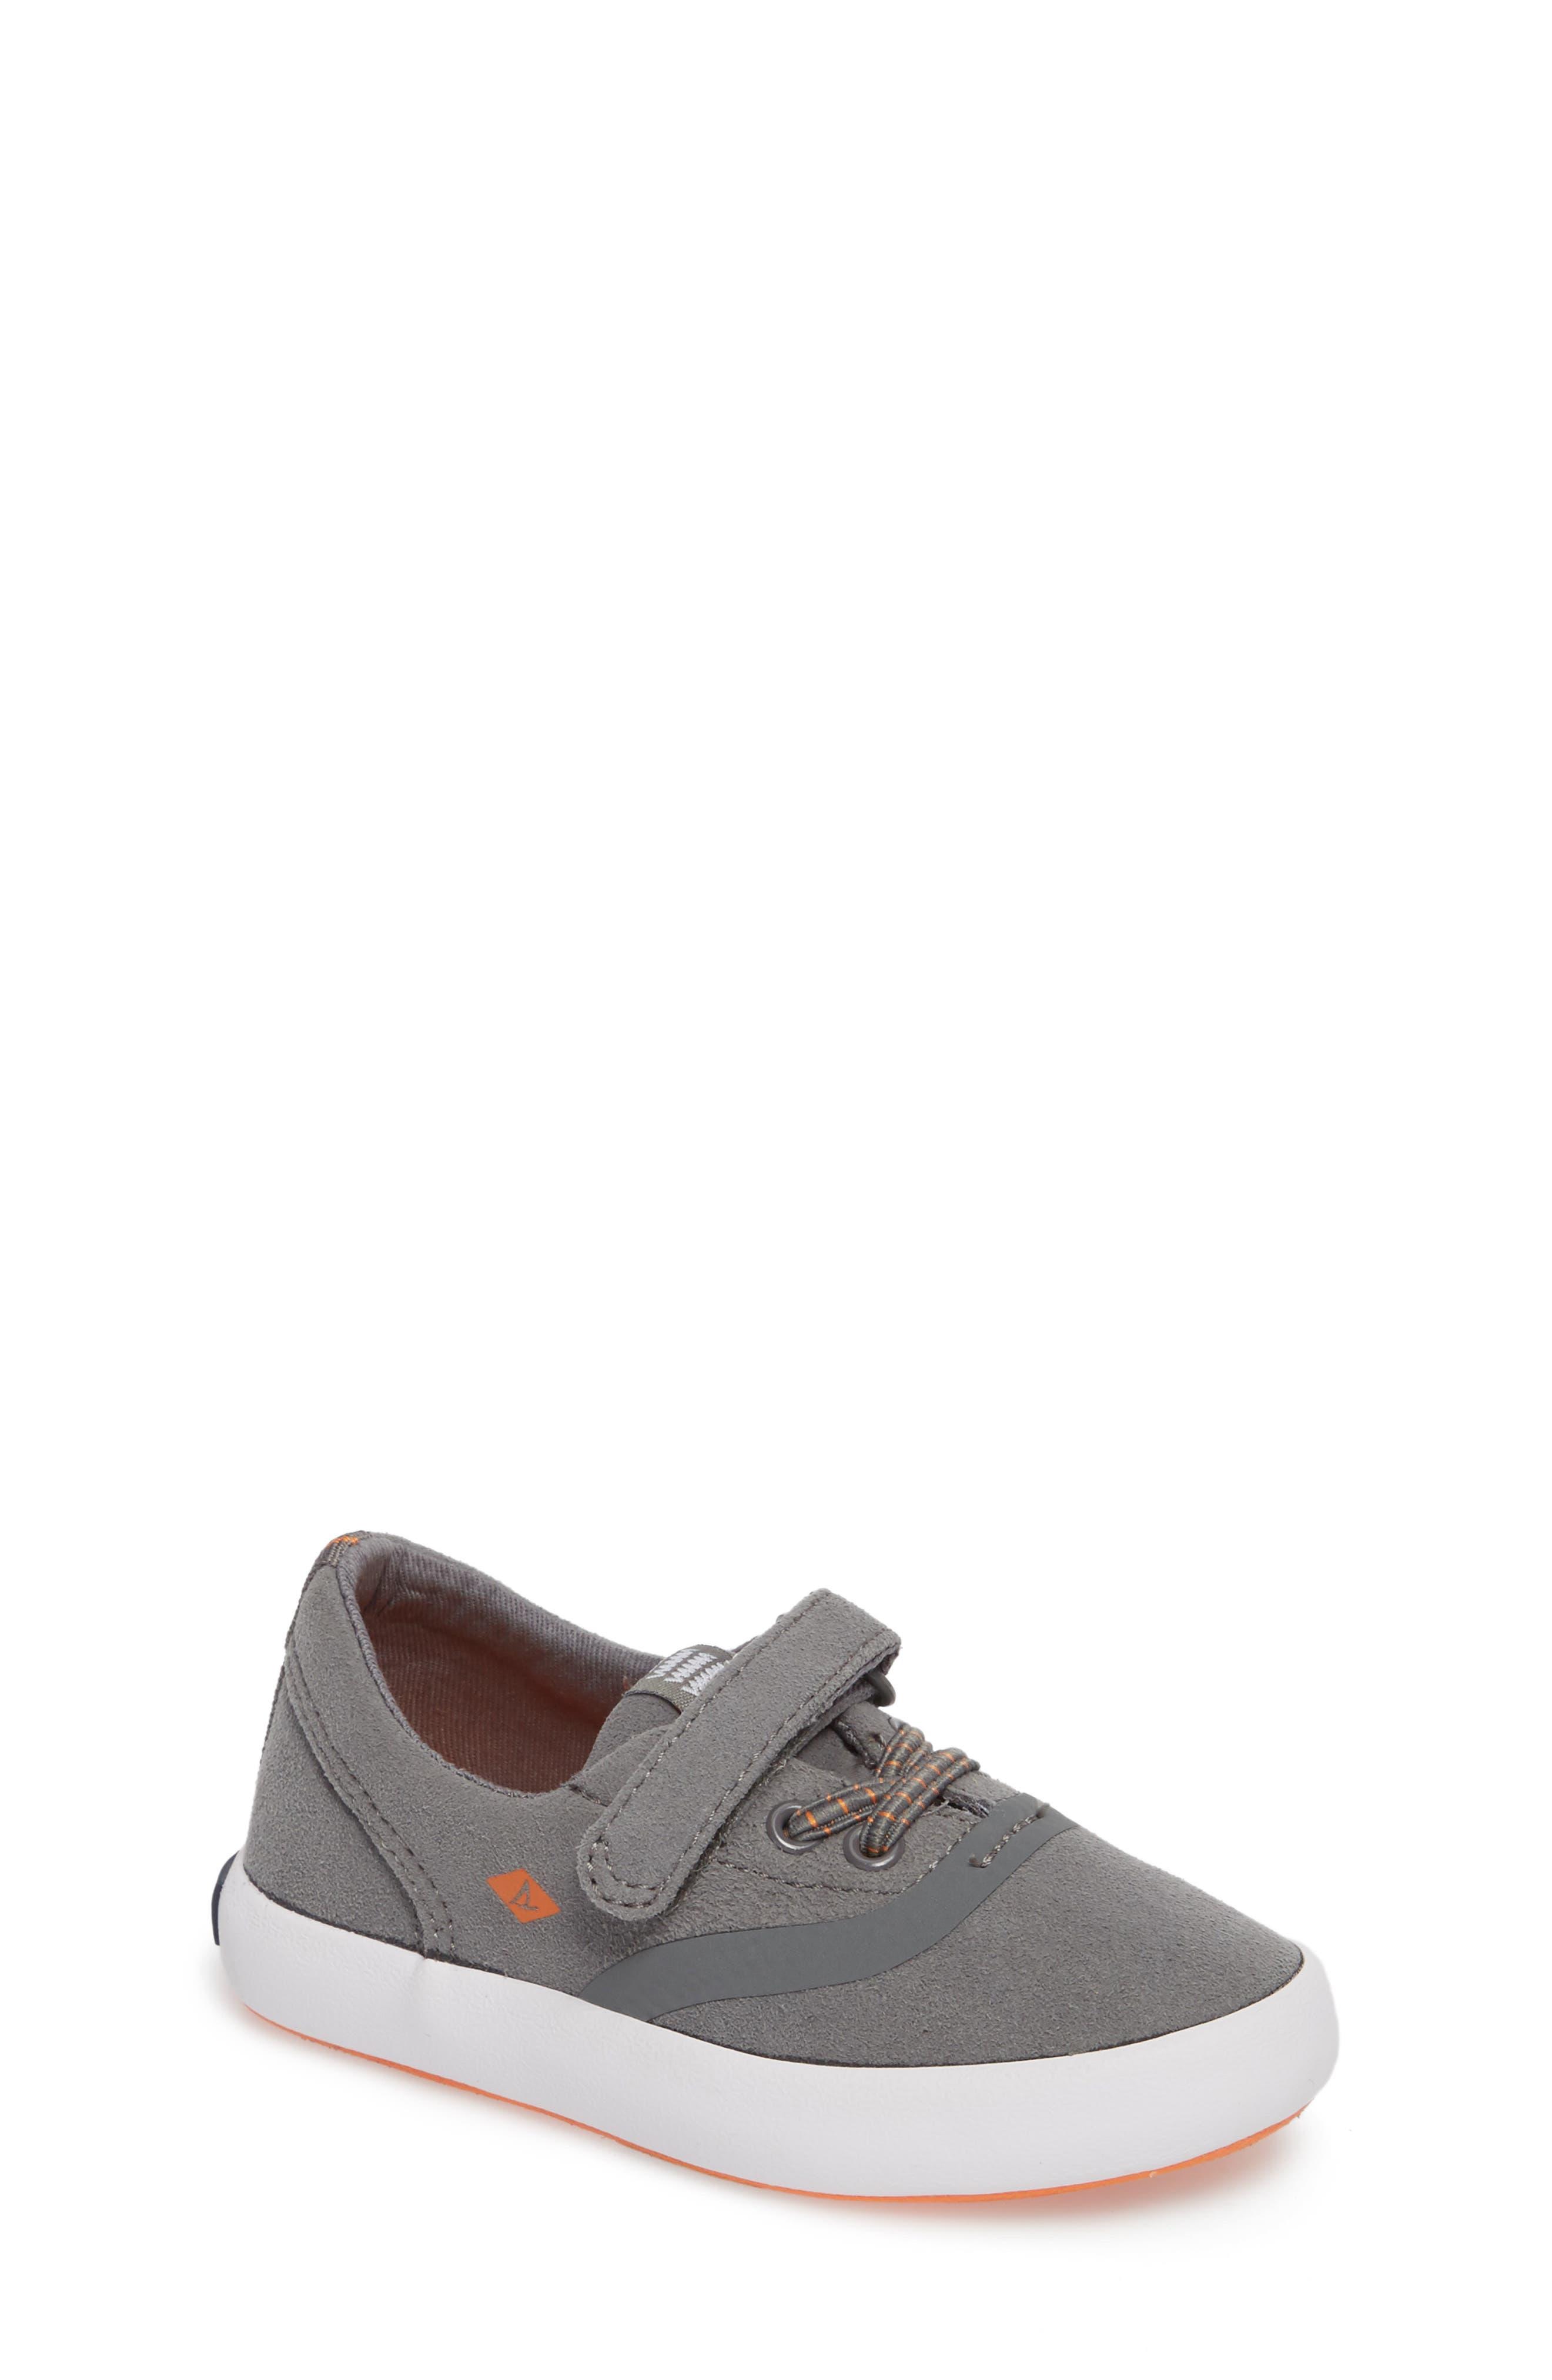 Wahoo Junior Sneaker,                             Main thumbnail 1, color,                             020